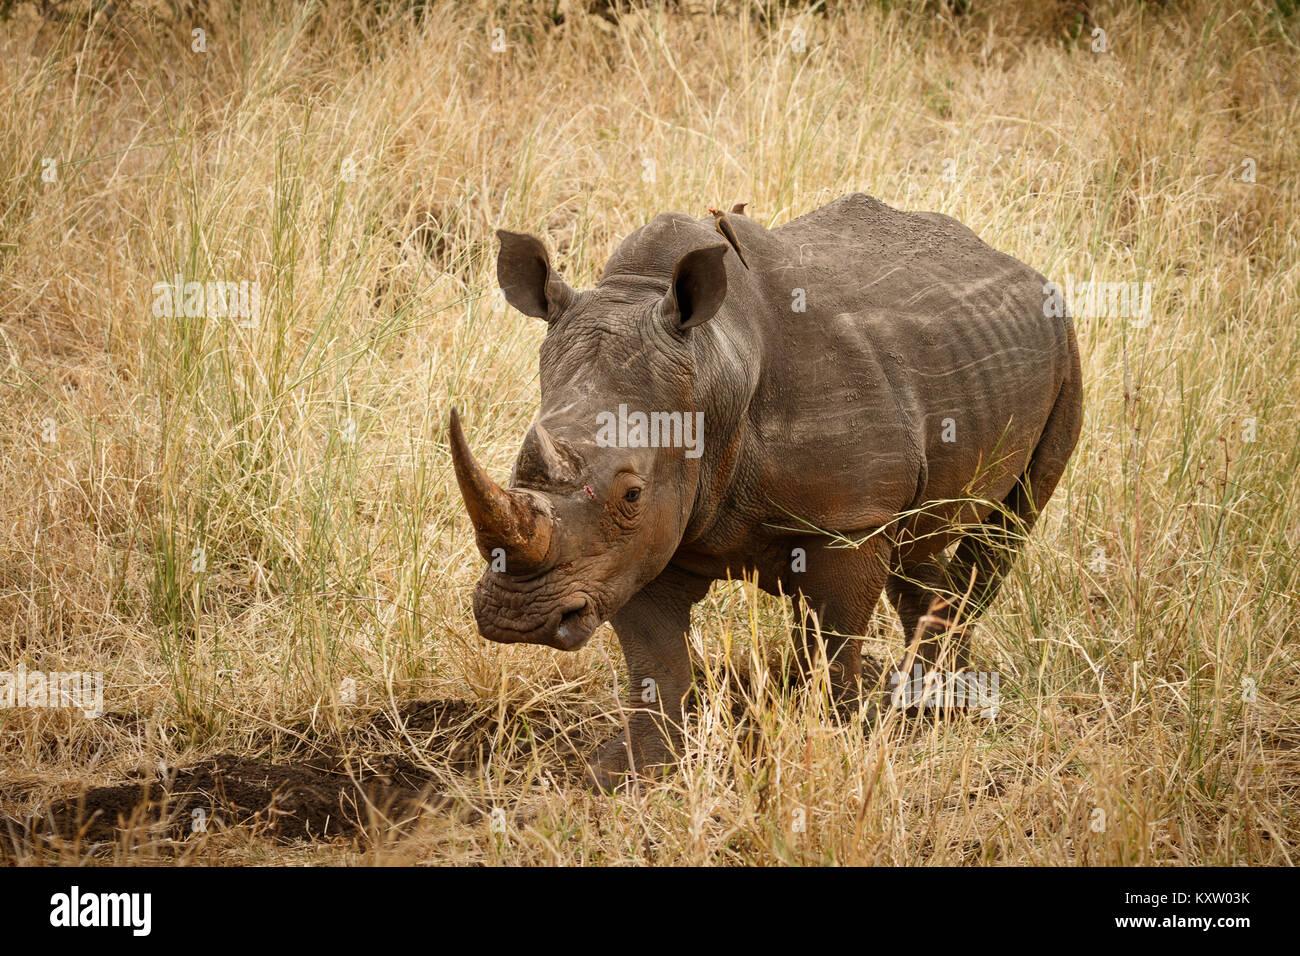 White Rhino in Grassland - Stock Image